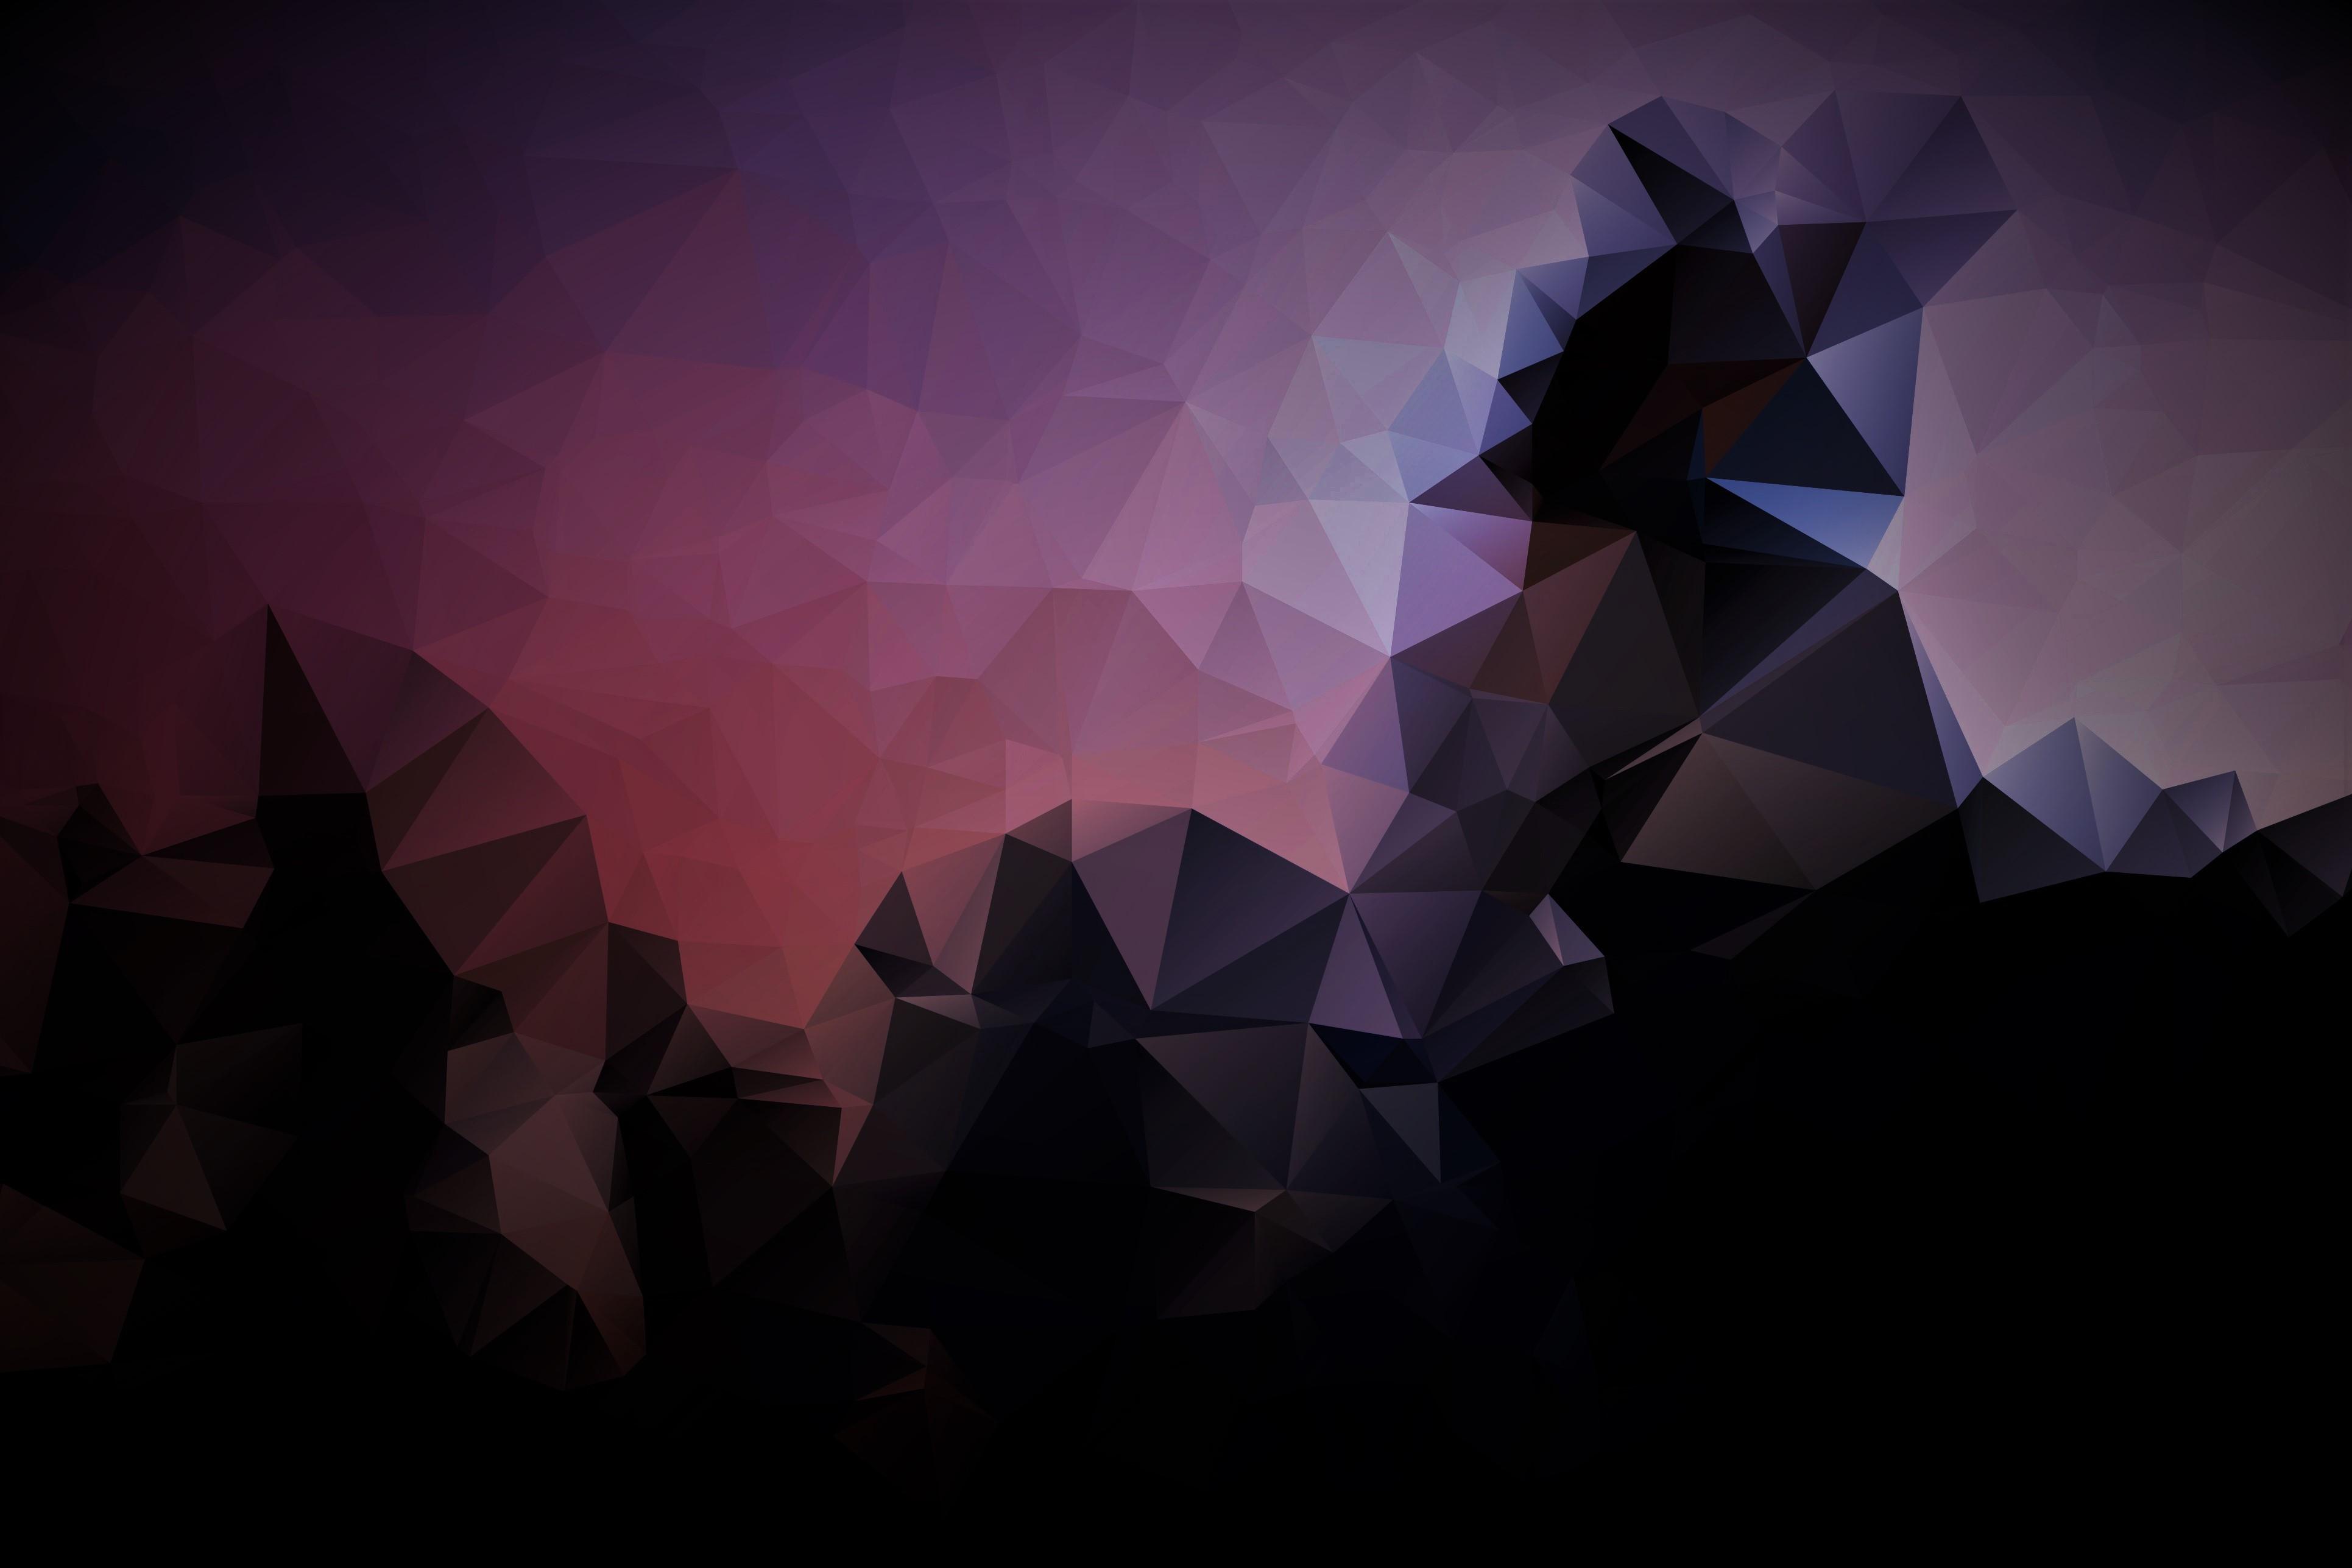 Wallpaper Sunlight Black Abstract 3d Symmetry Triangle